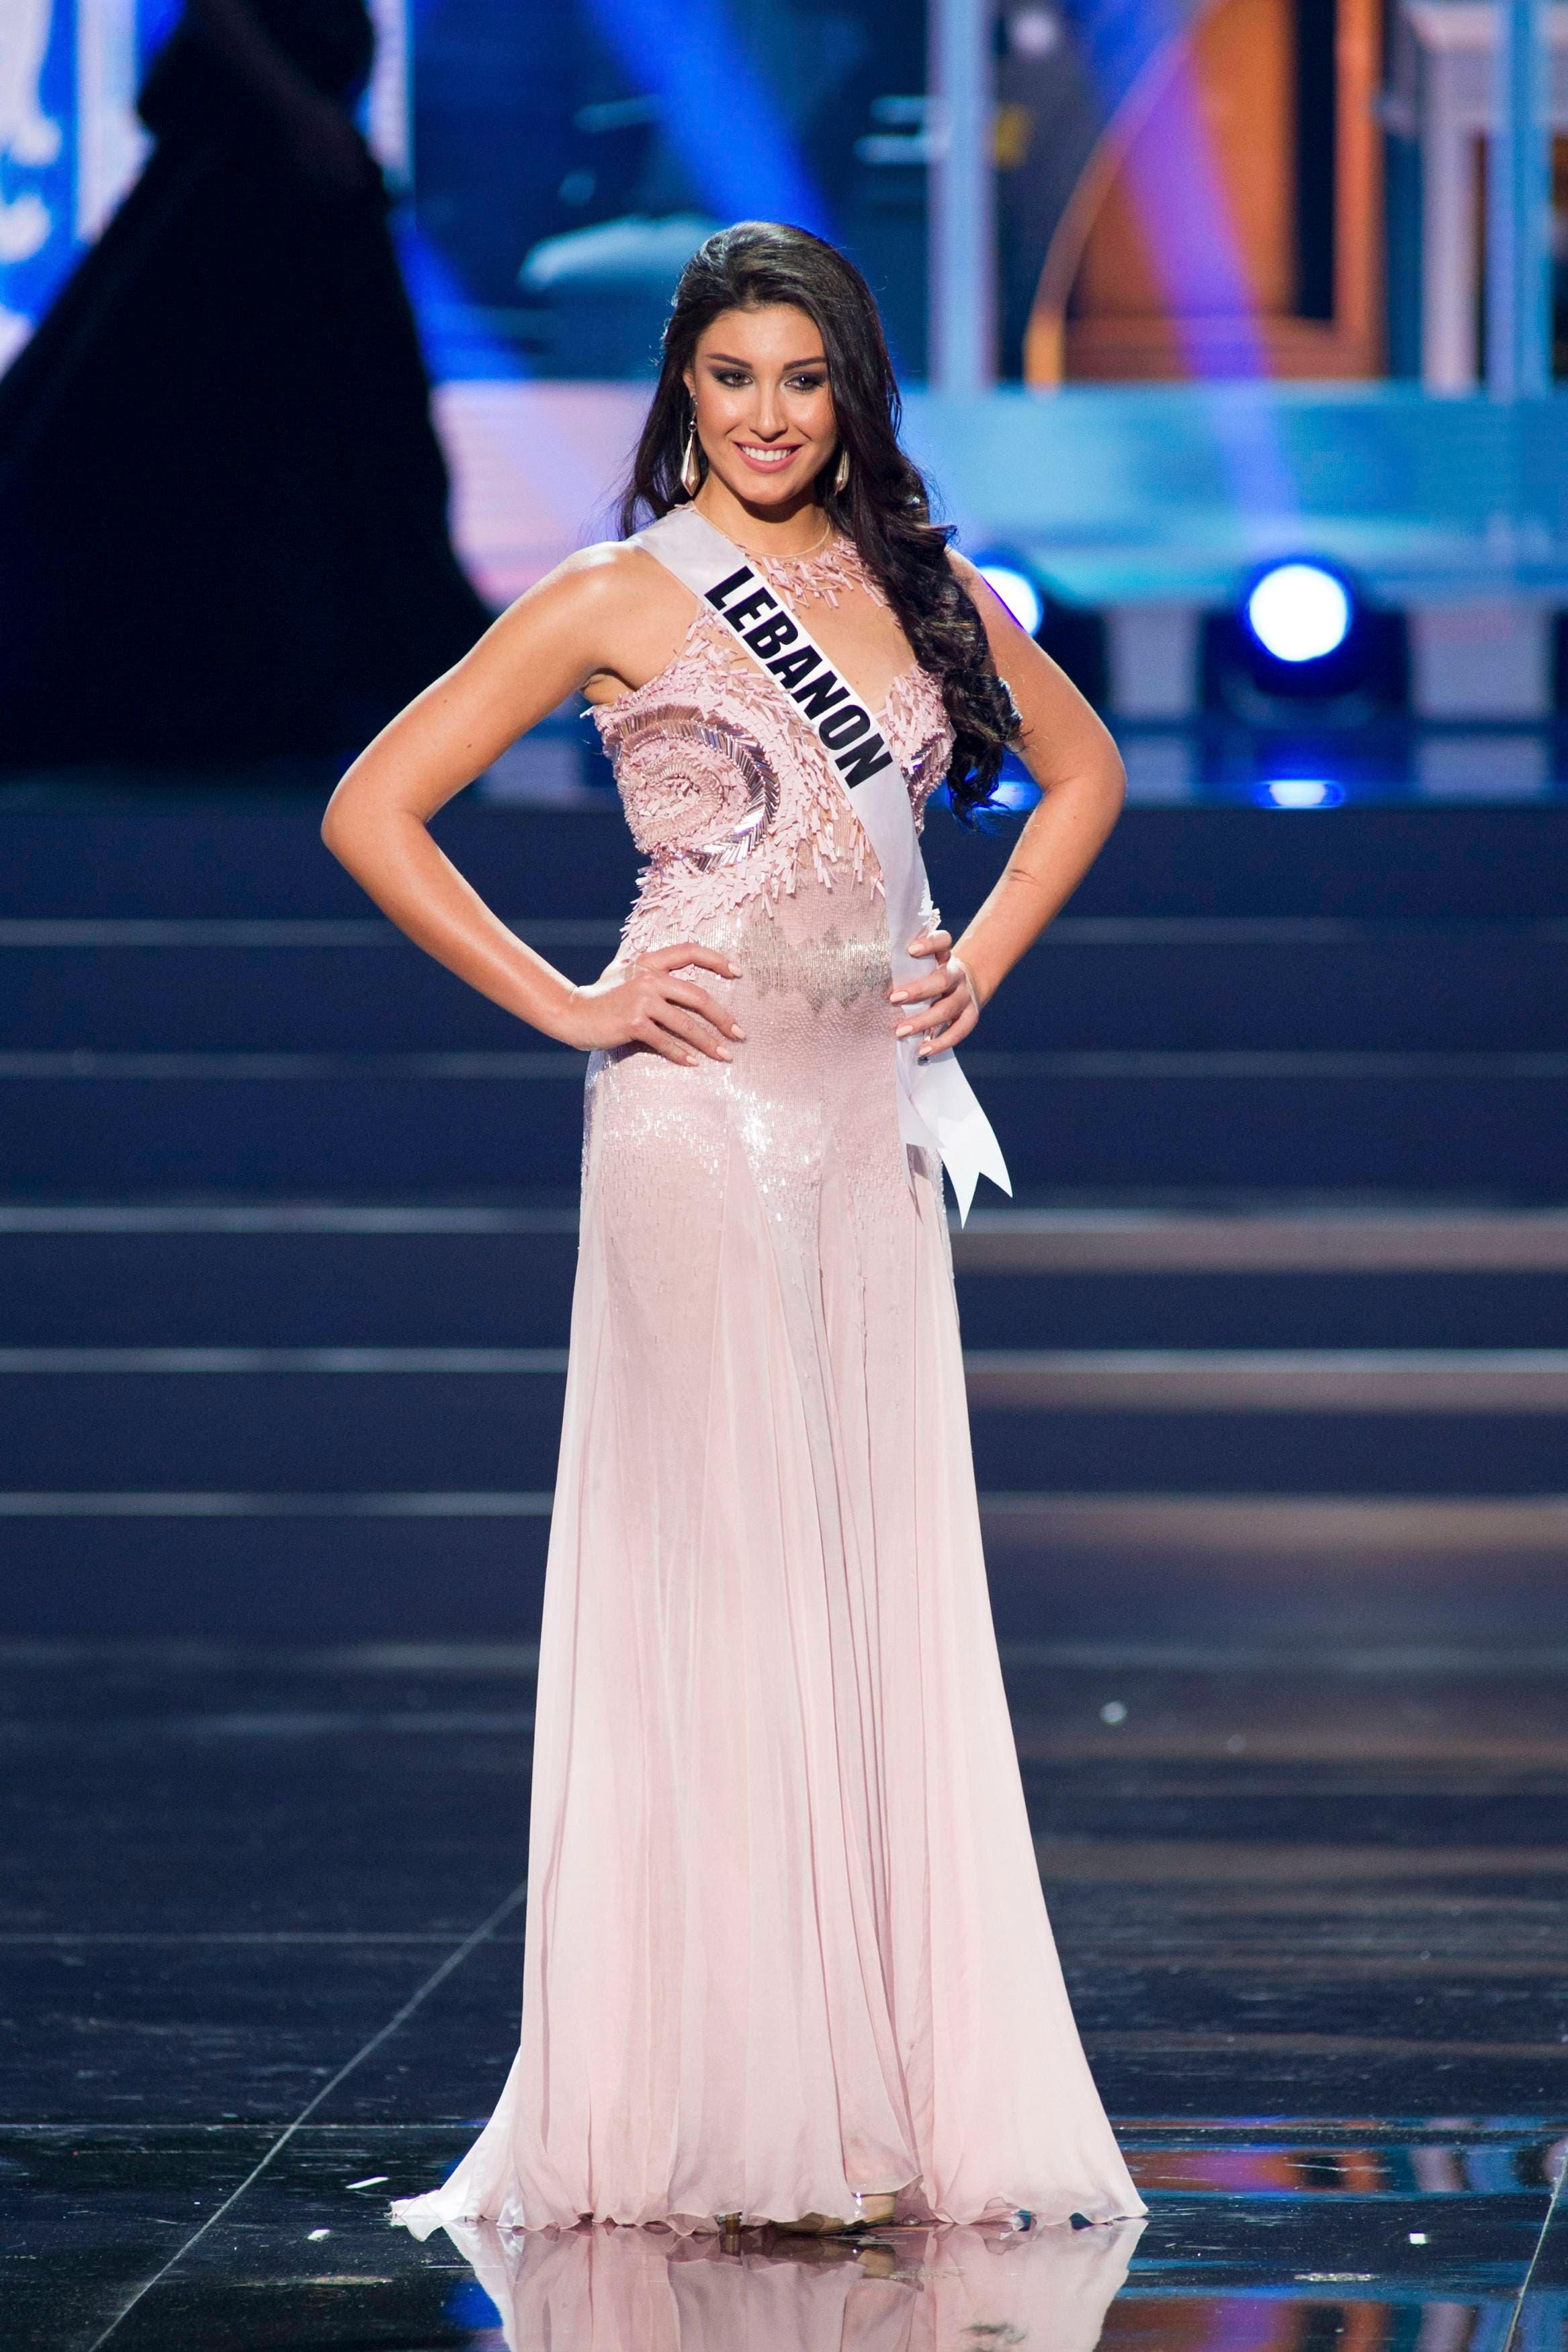 Miss Universe 2013 preliminary competition - Al Arabiya English